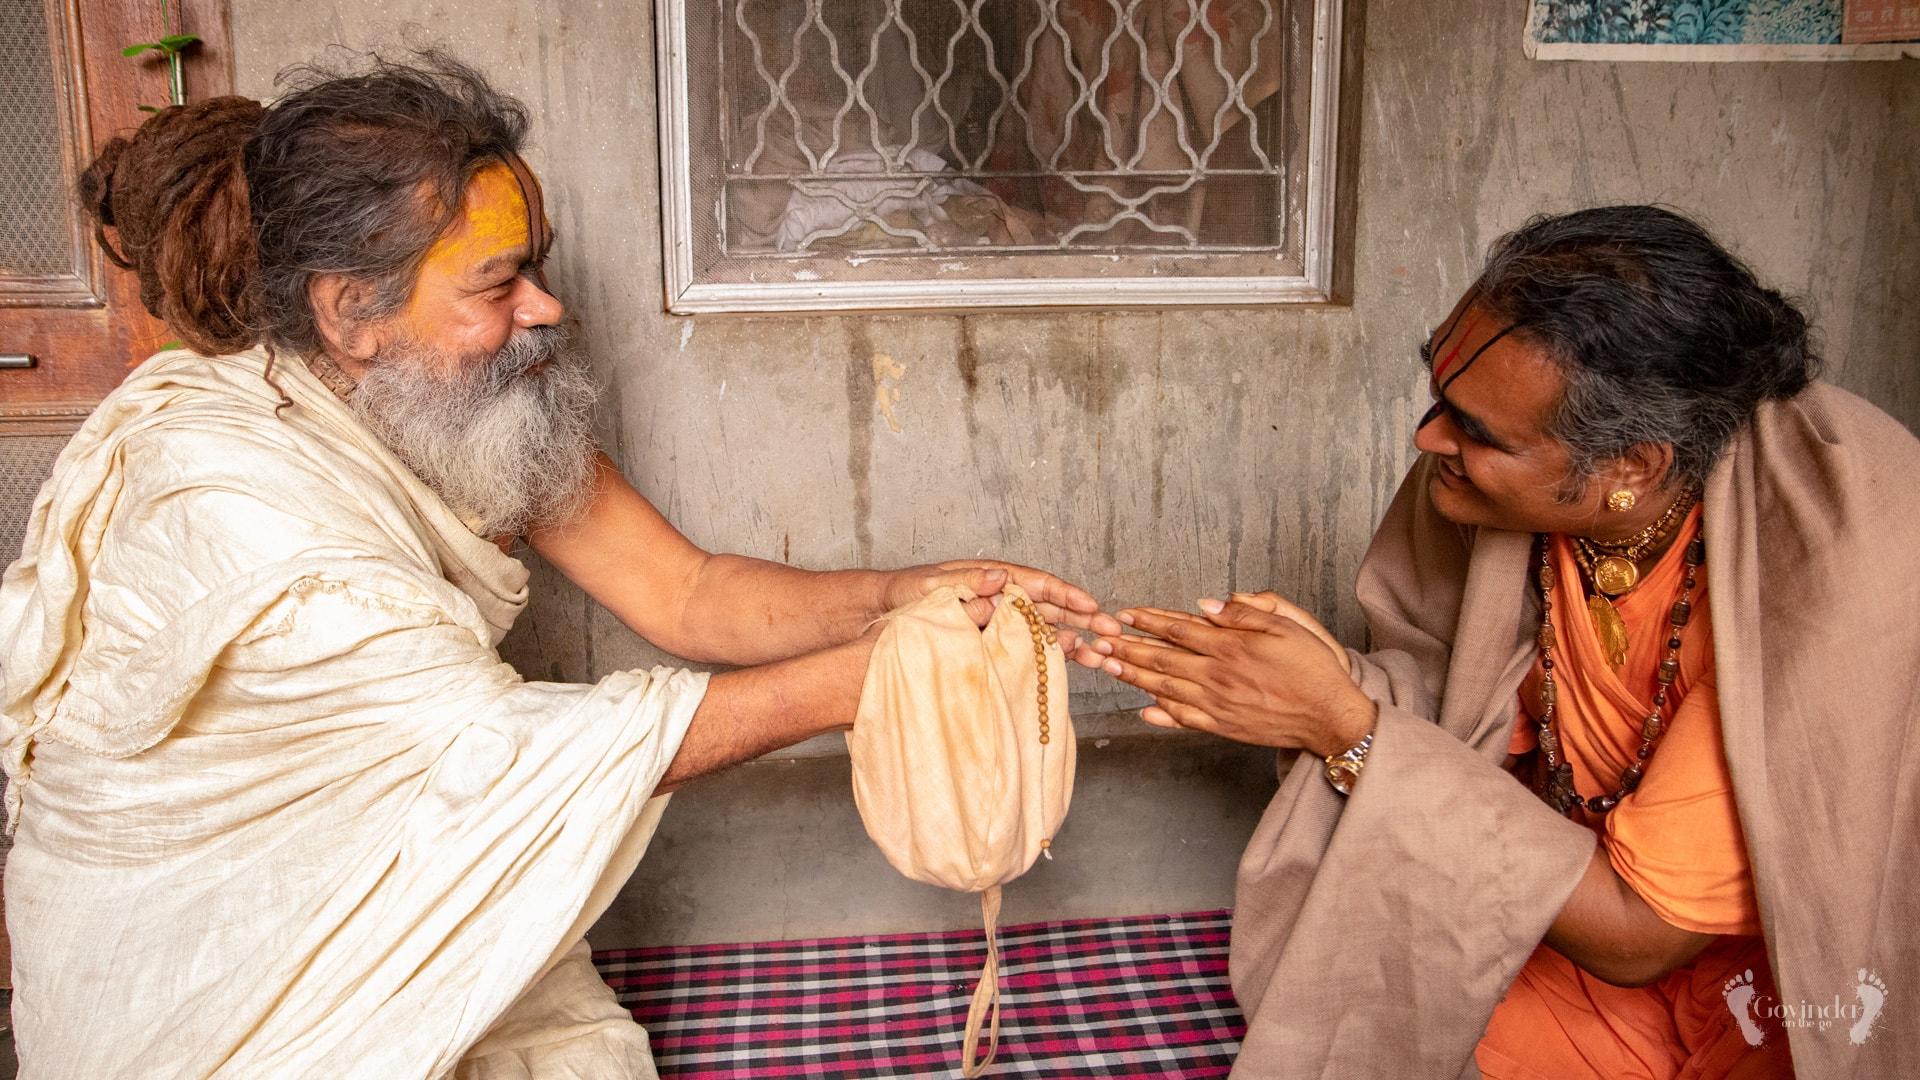 Humility embodied - Sri Vinod Ras Bihari and Paramahamsa Vishwananda bowing down to each other